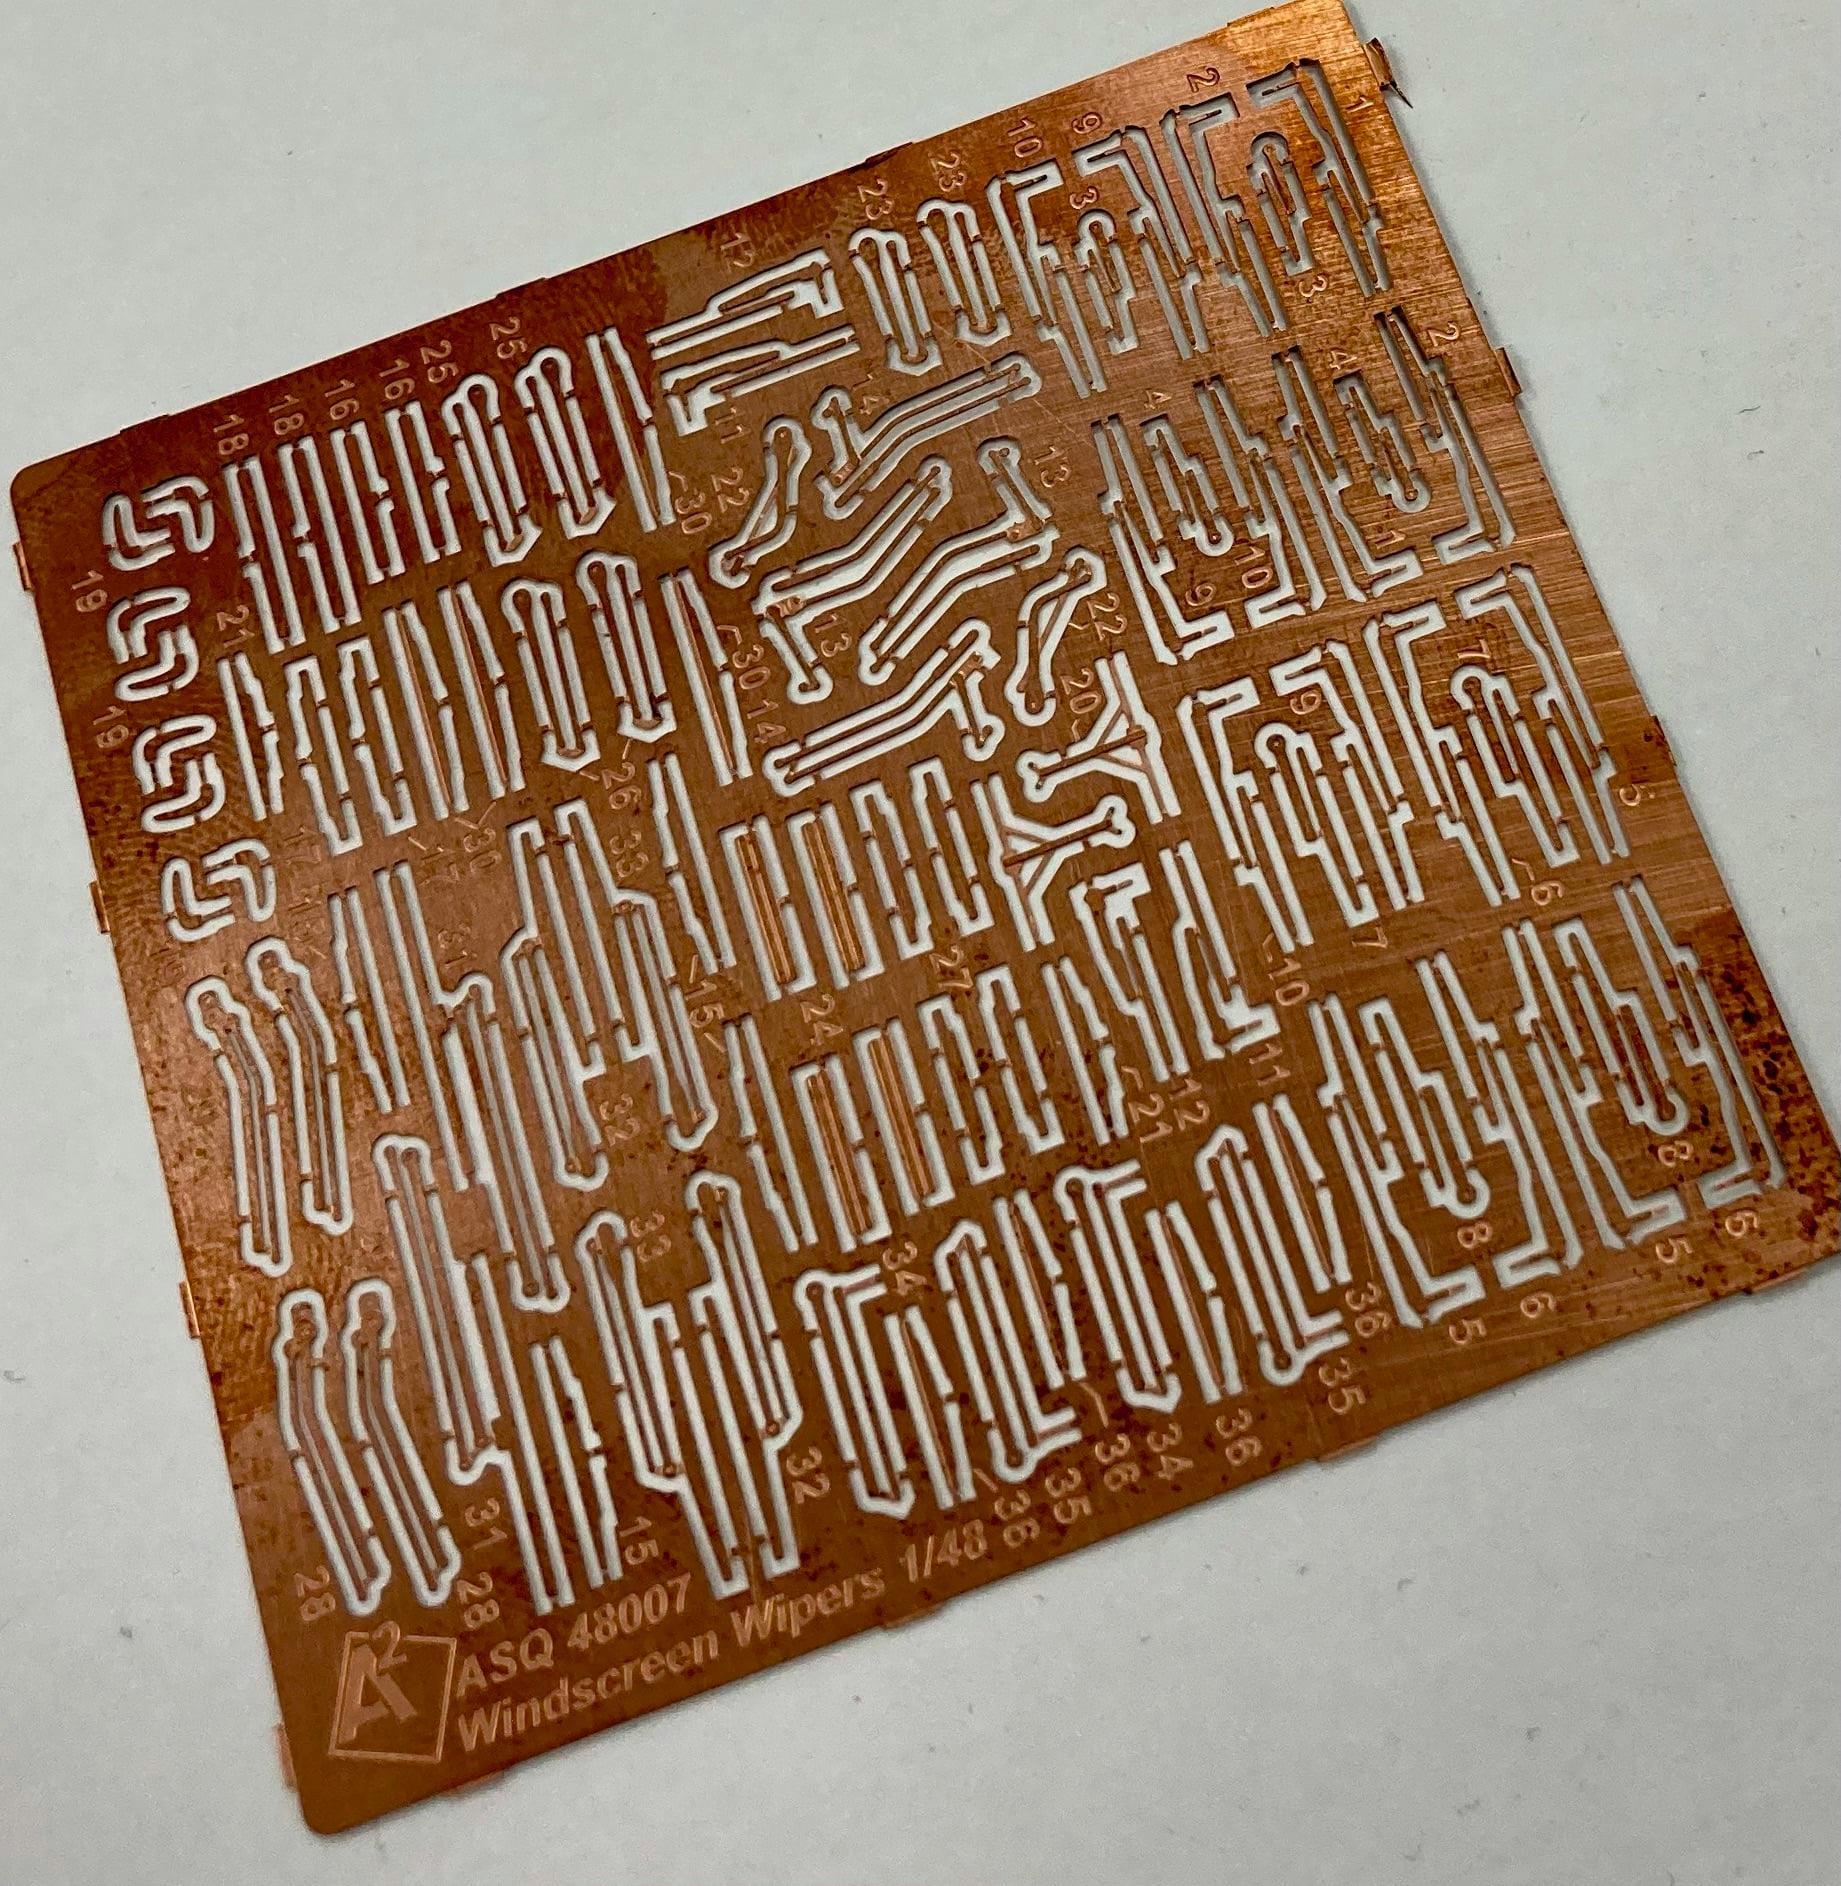 AASQ48007